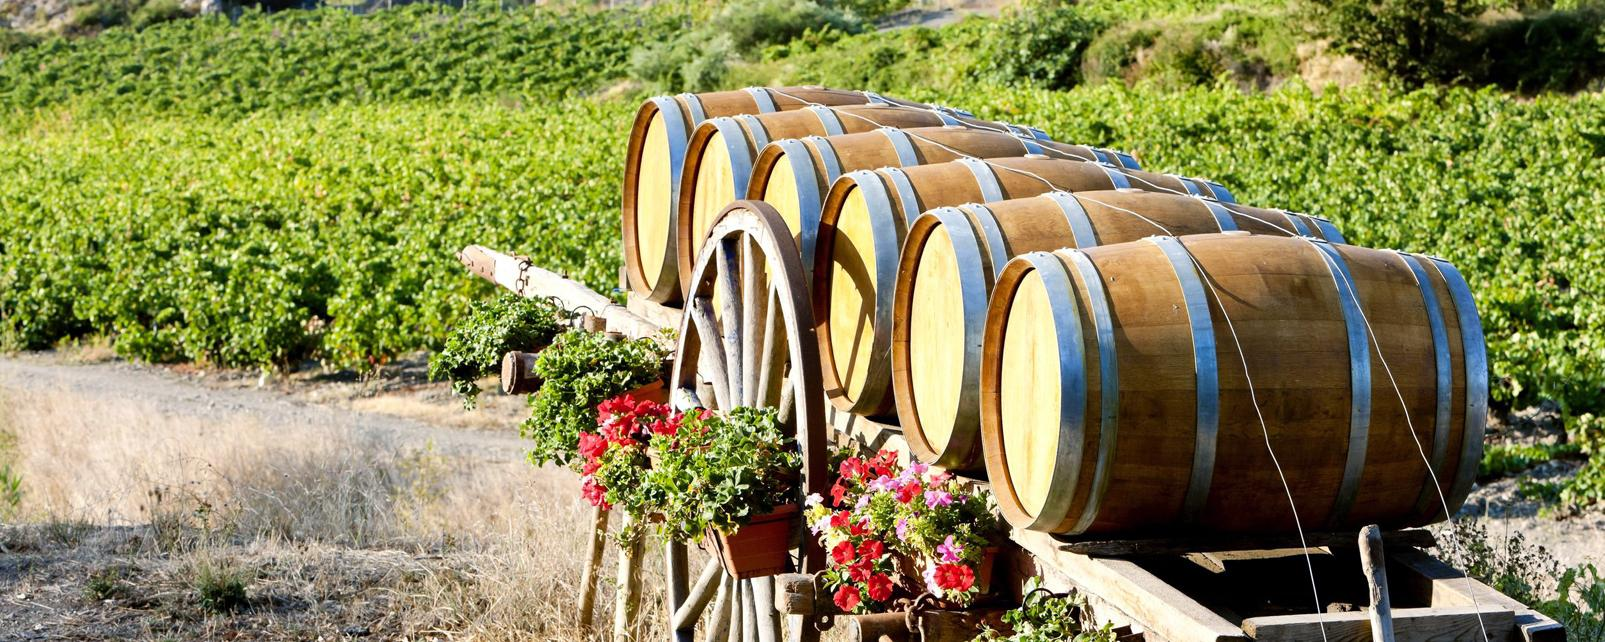 Sigean, Languedoc-Rosellon, Francia